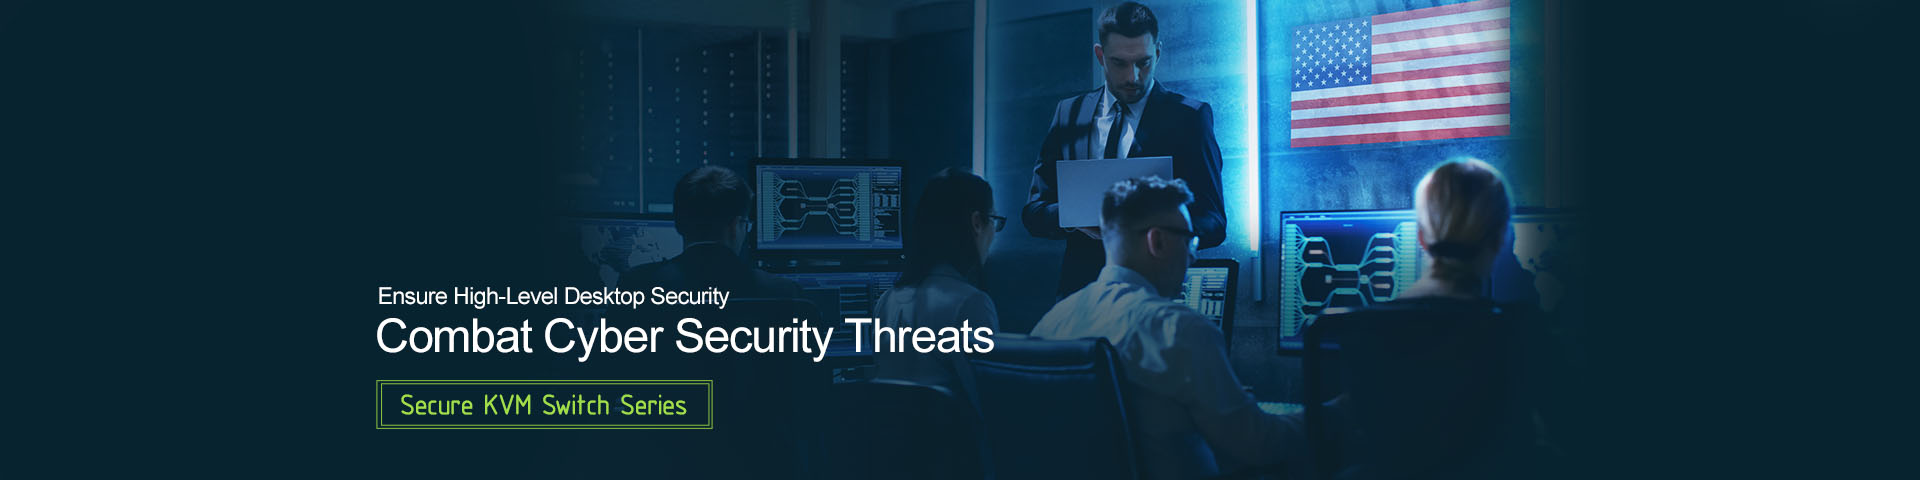 Secure KVM - NIAP Certified Secure KVMs - Profile Protection 3.0